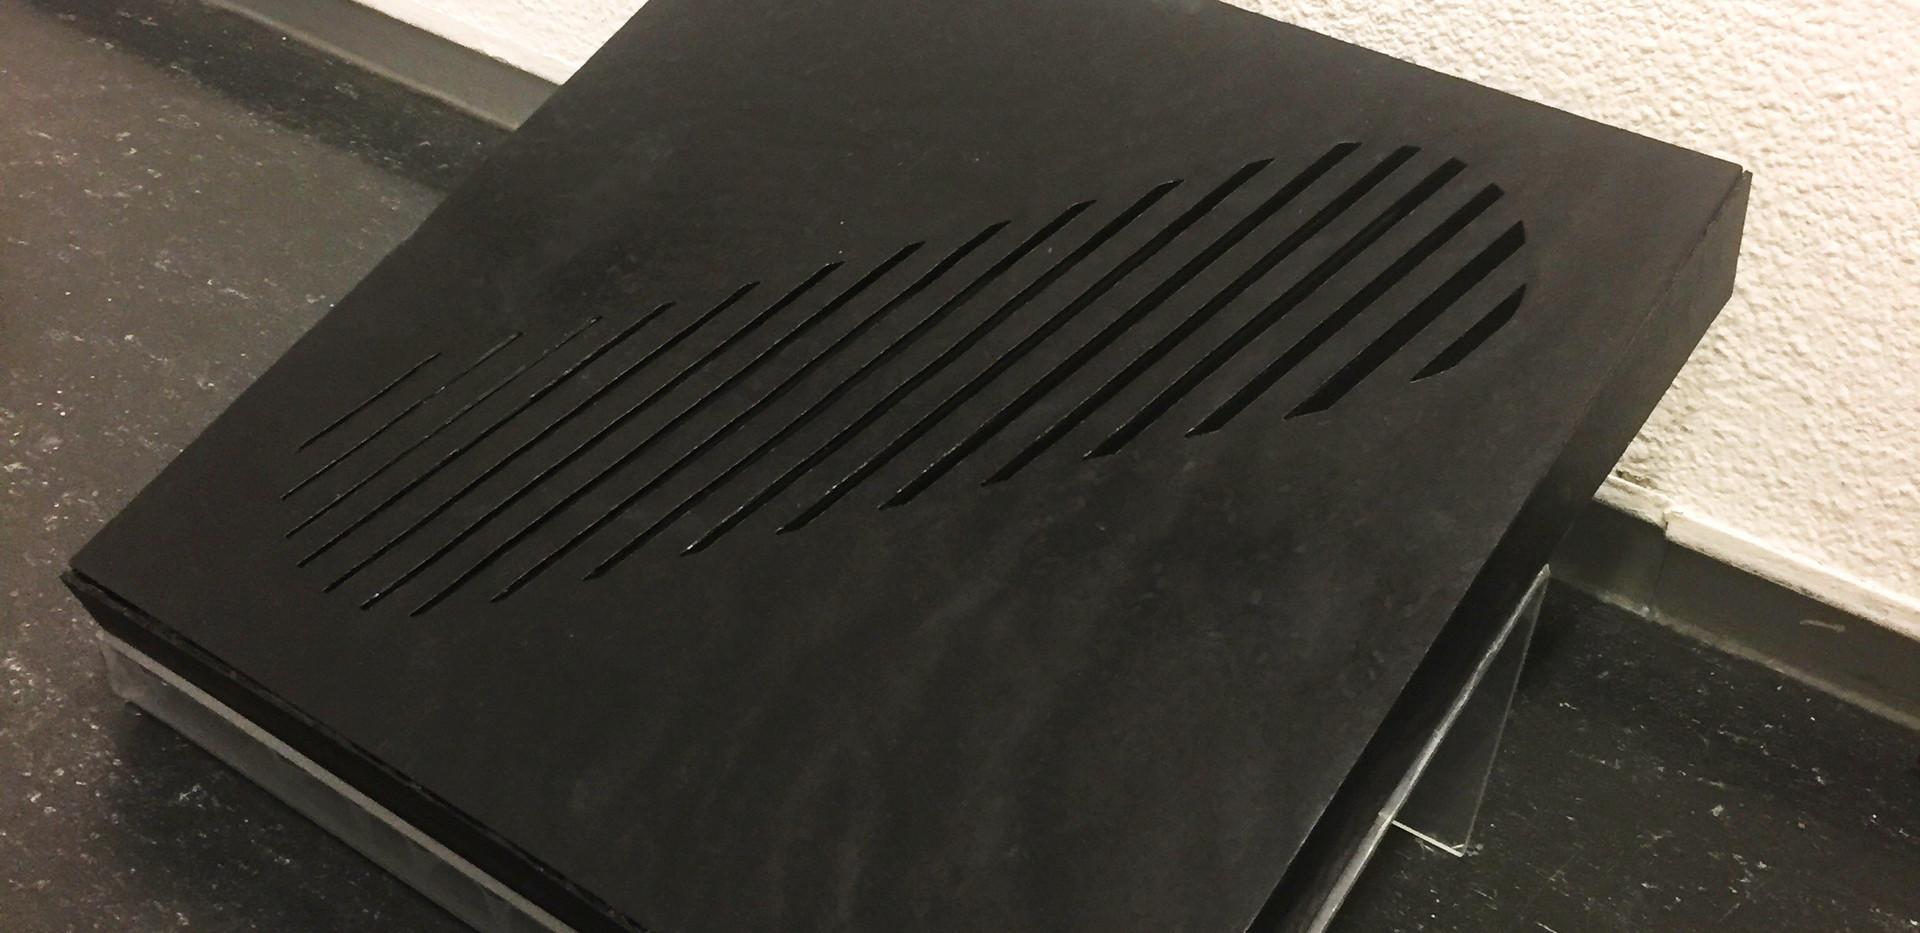 Prototype side walk tile